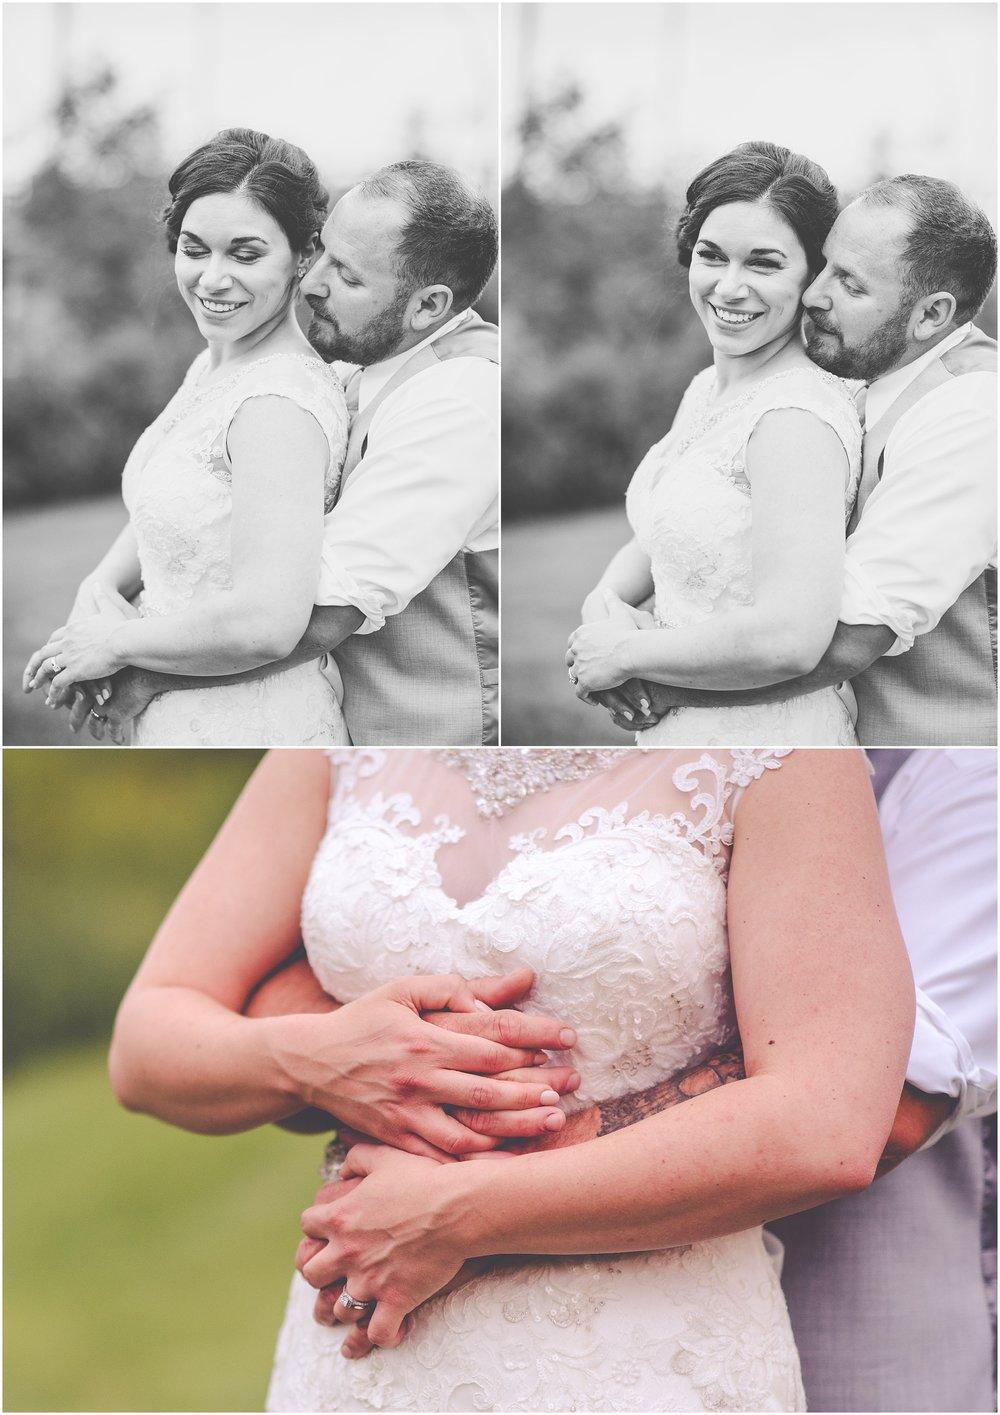 Kara Evans Photographer - Central Illinois Wedding Photographer - Kankakee County Wedding Photographer - Kankakee Train Depot Wedding Photos